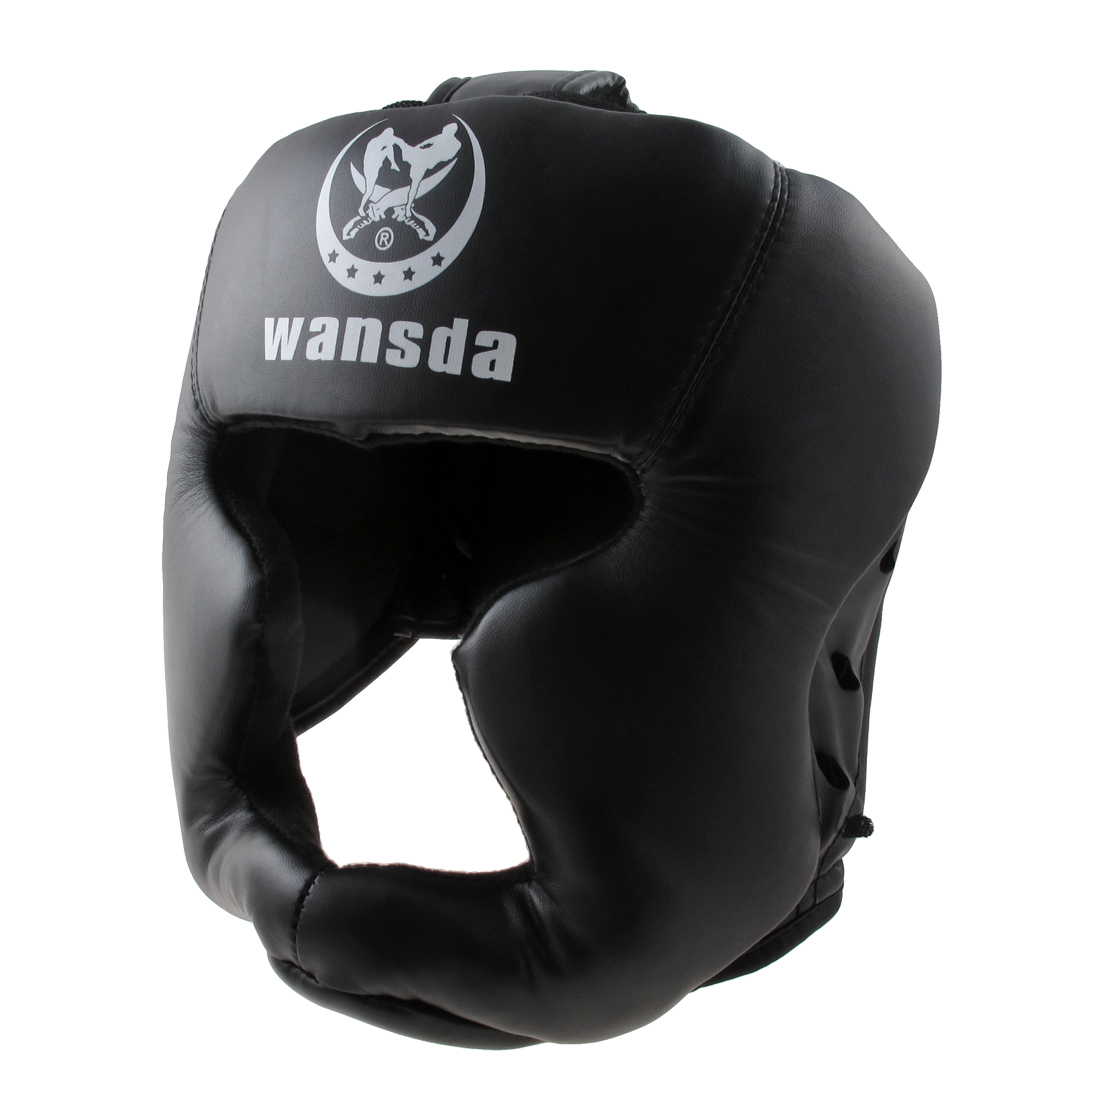 Faux Leather Padded Head Guard Helmet Training Kick Boxing Headgear Black